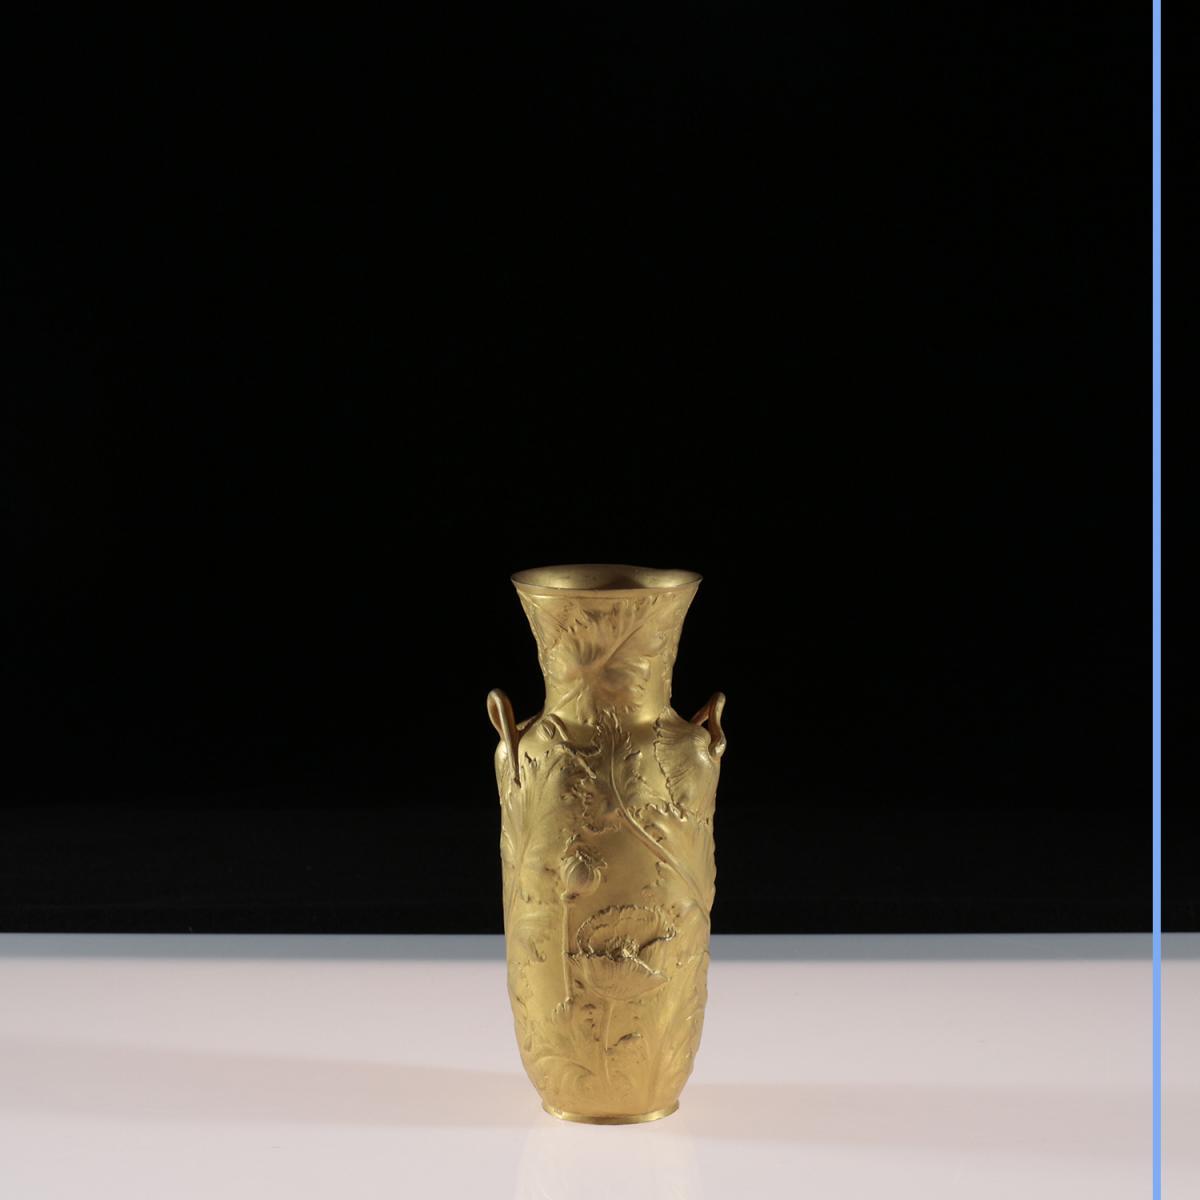 Alexandre Vibert (1847-1909), vase en bronze doré, XIXe